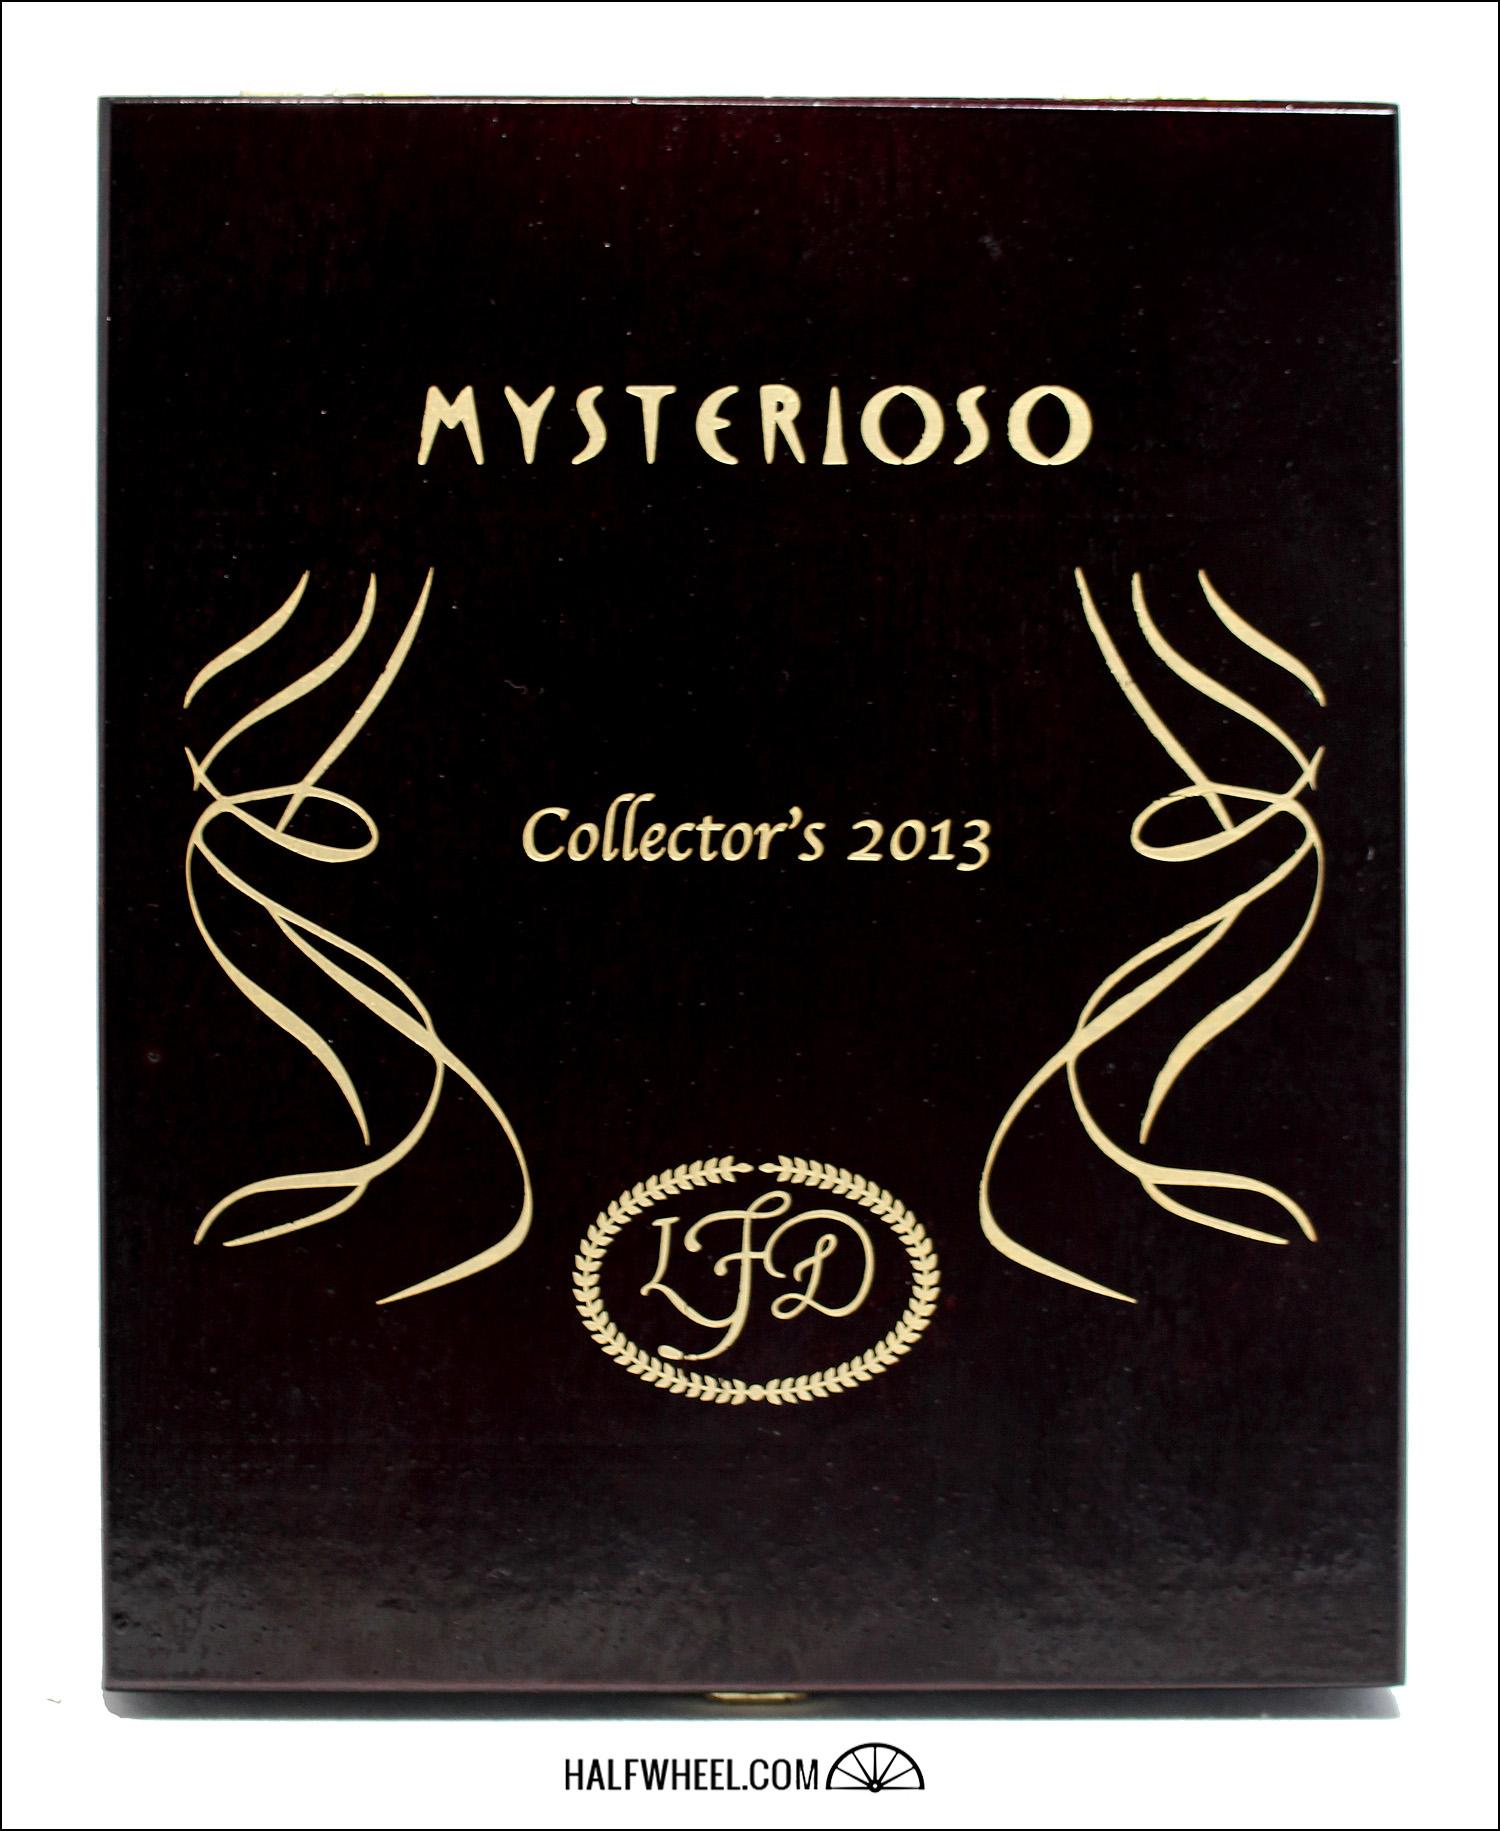 La Flor Dominicana Mysterioso Collector s 2013 Box 1